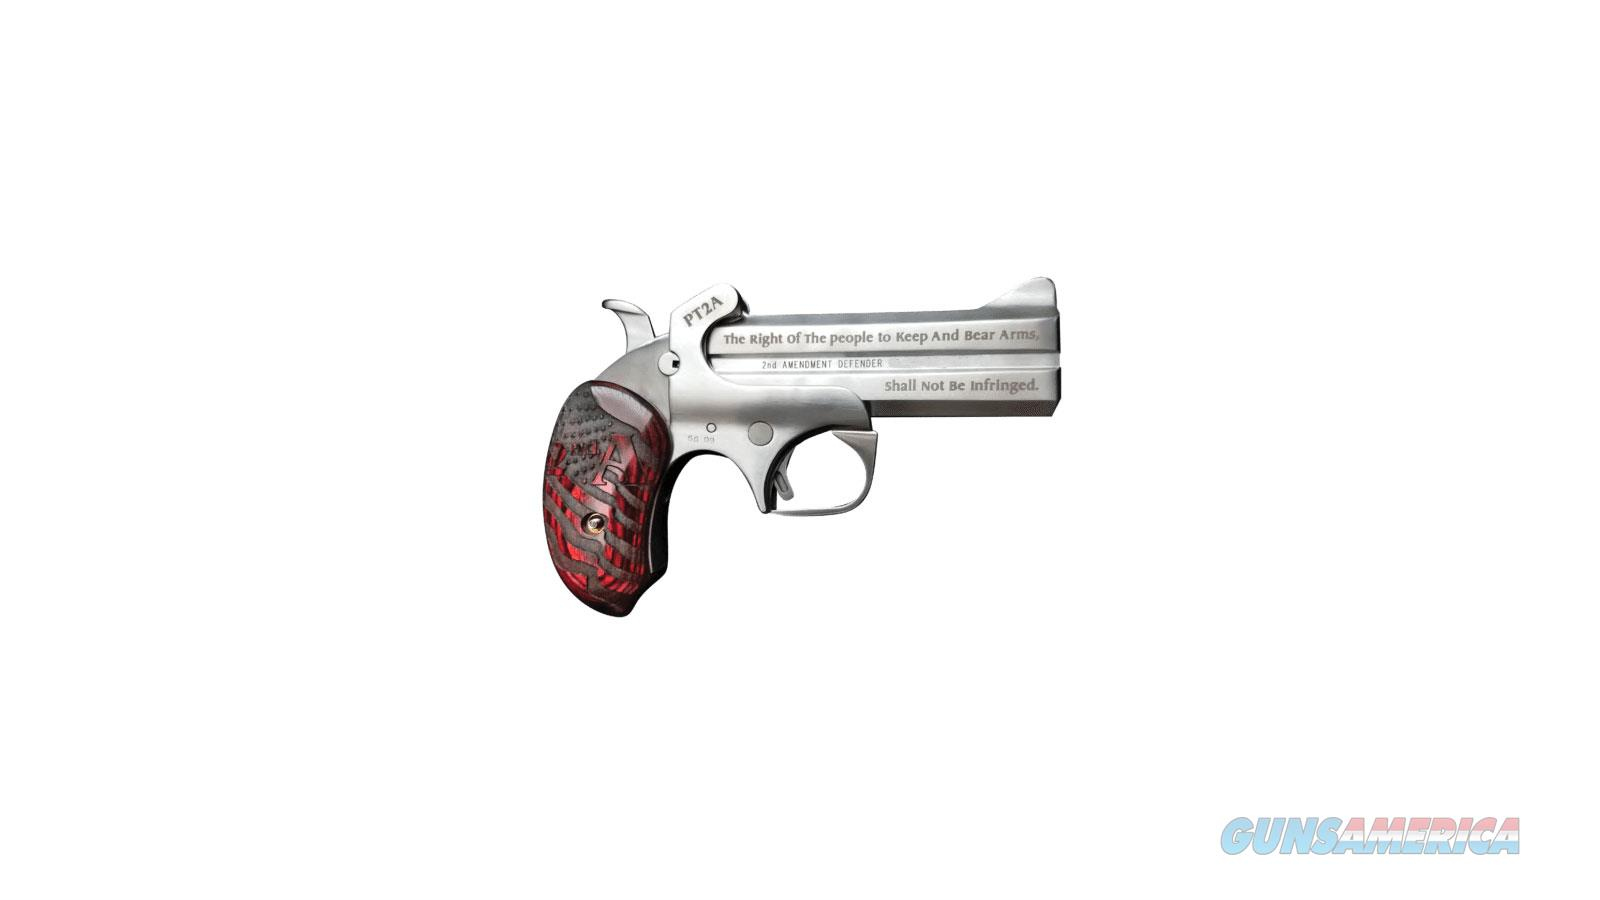 "Bond Arms Pt2a 357Mag/38Spl 4.25"" PT2A357/38  Guns > Pistols > B Misc Pistols"